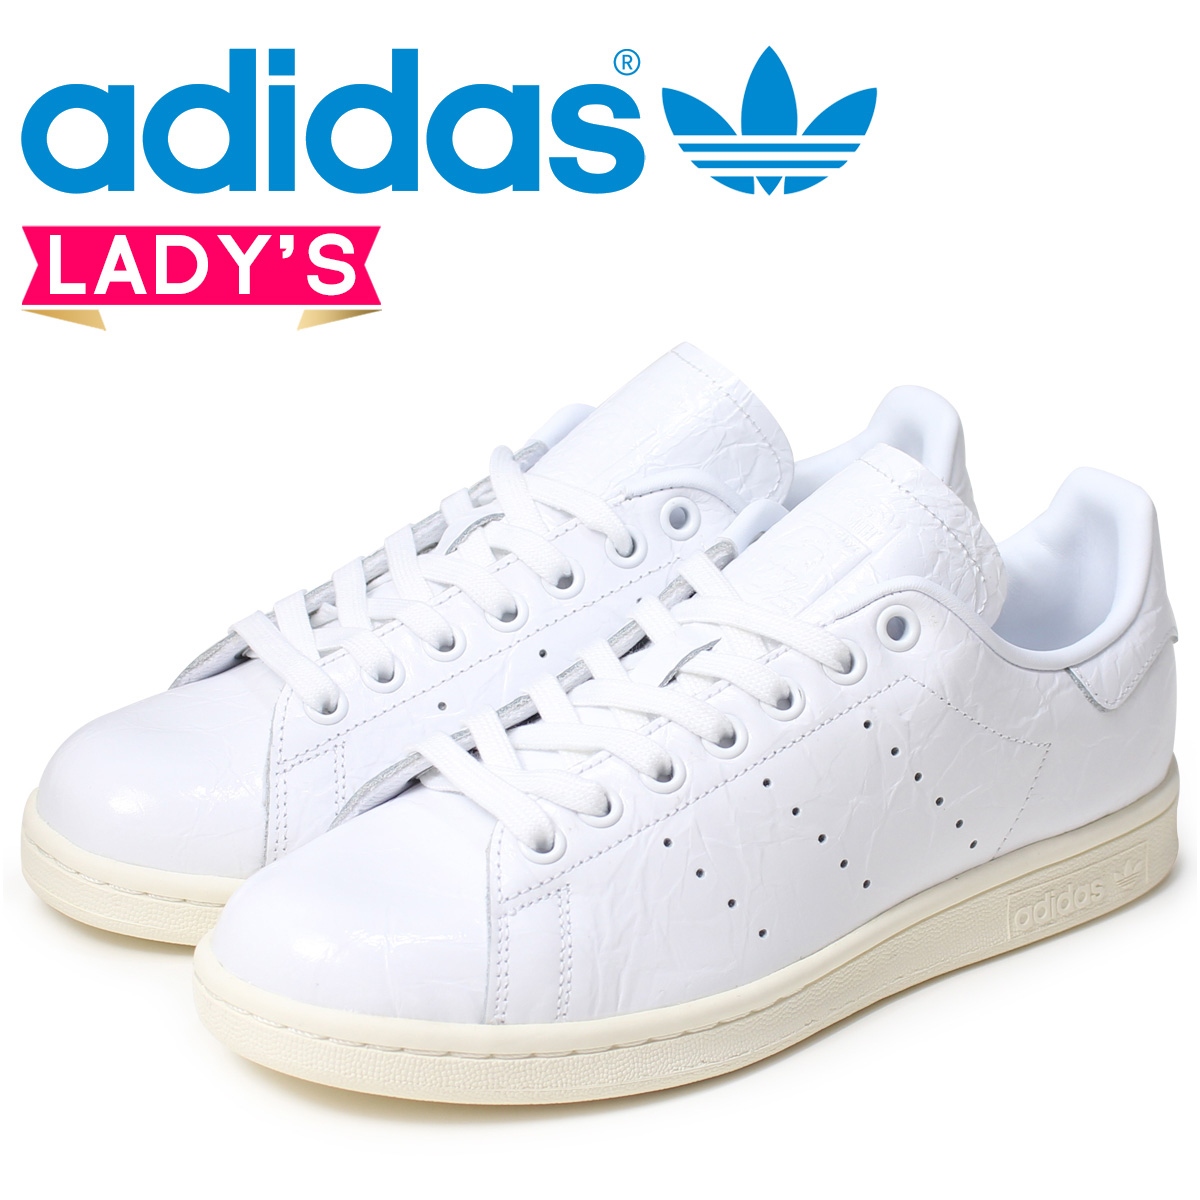 adidas スタンスミス レディース スニーカー アディダス Originals STAN SMITH W BB5162 靴 ホワイト オリジナルス